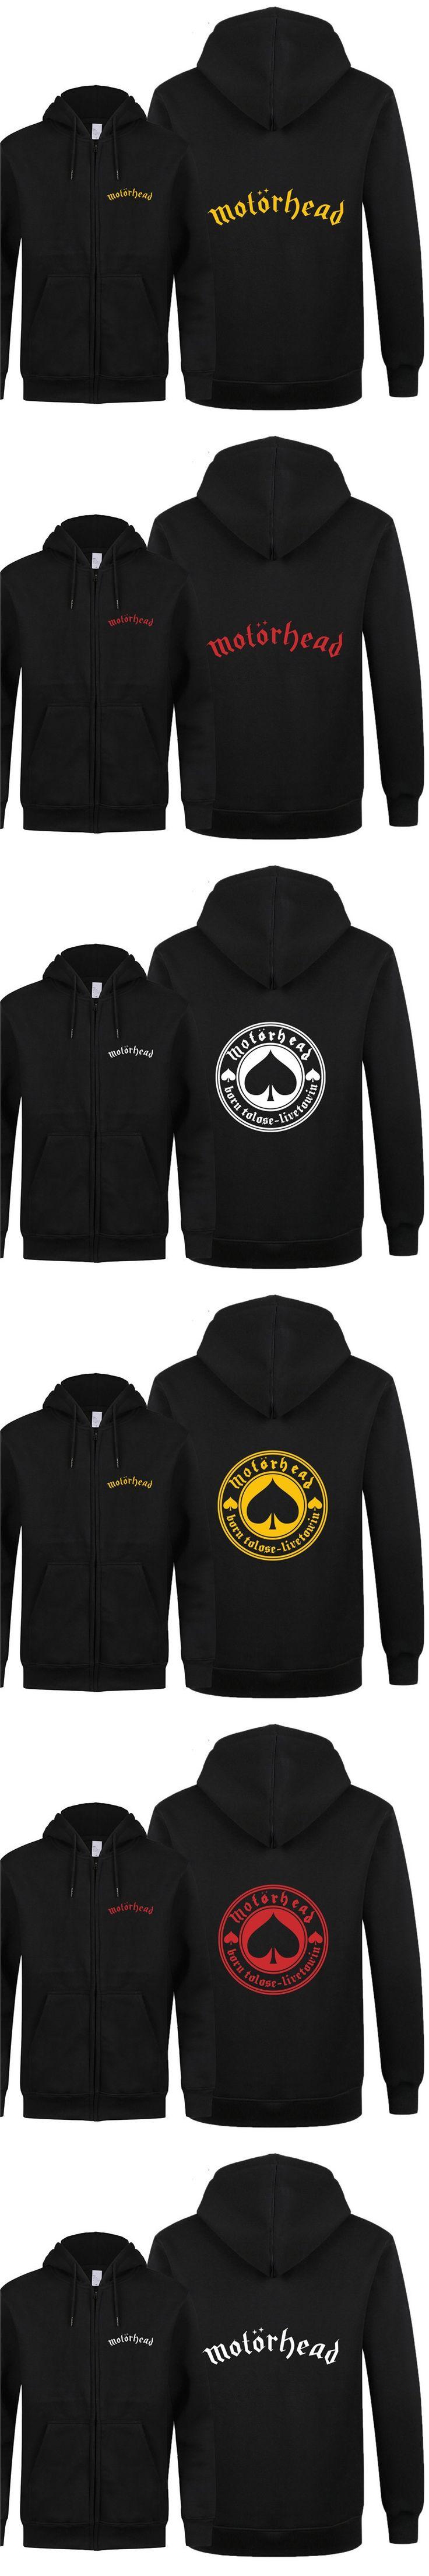 2018 Autumn Motorhead Fleece Sweatshirts Rock Band Born To Lose Live To Win Men Zipper Hoodies Punk Motorhead Men Hip Hop Coat J